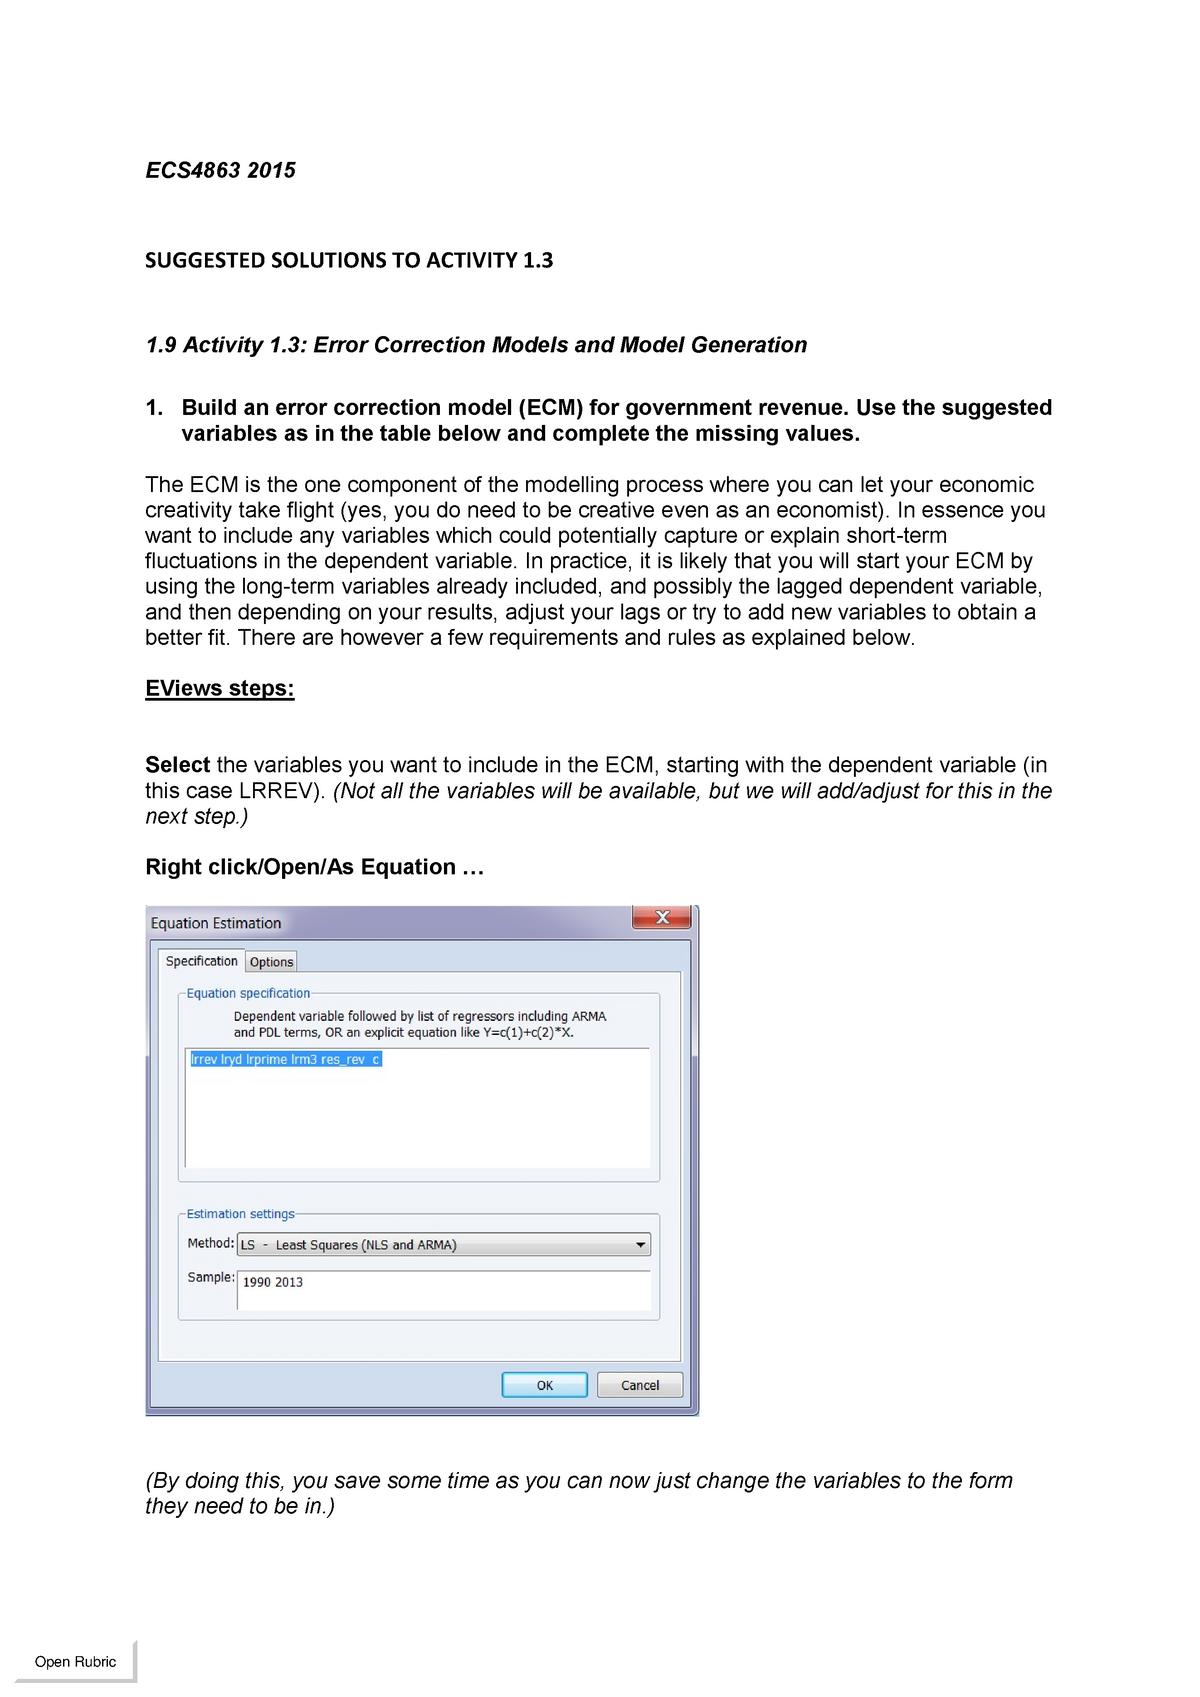 ECS4863 2015 Solutions to Activity 1 3 pdf - ECC321: Econometrics